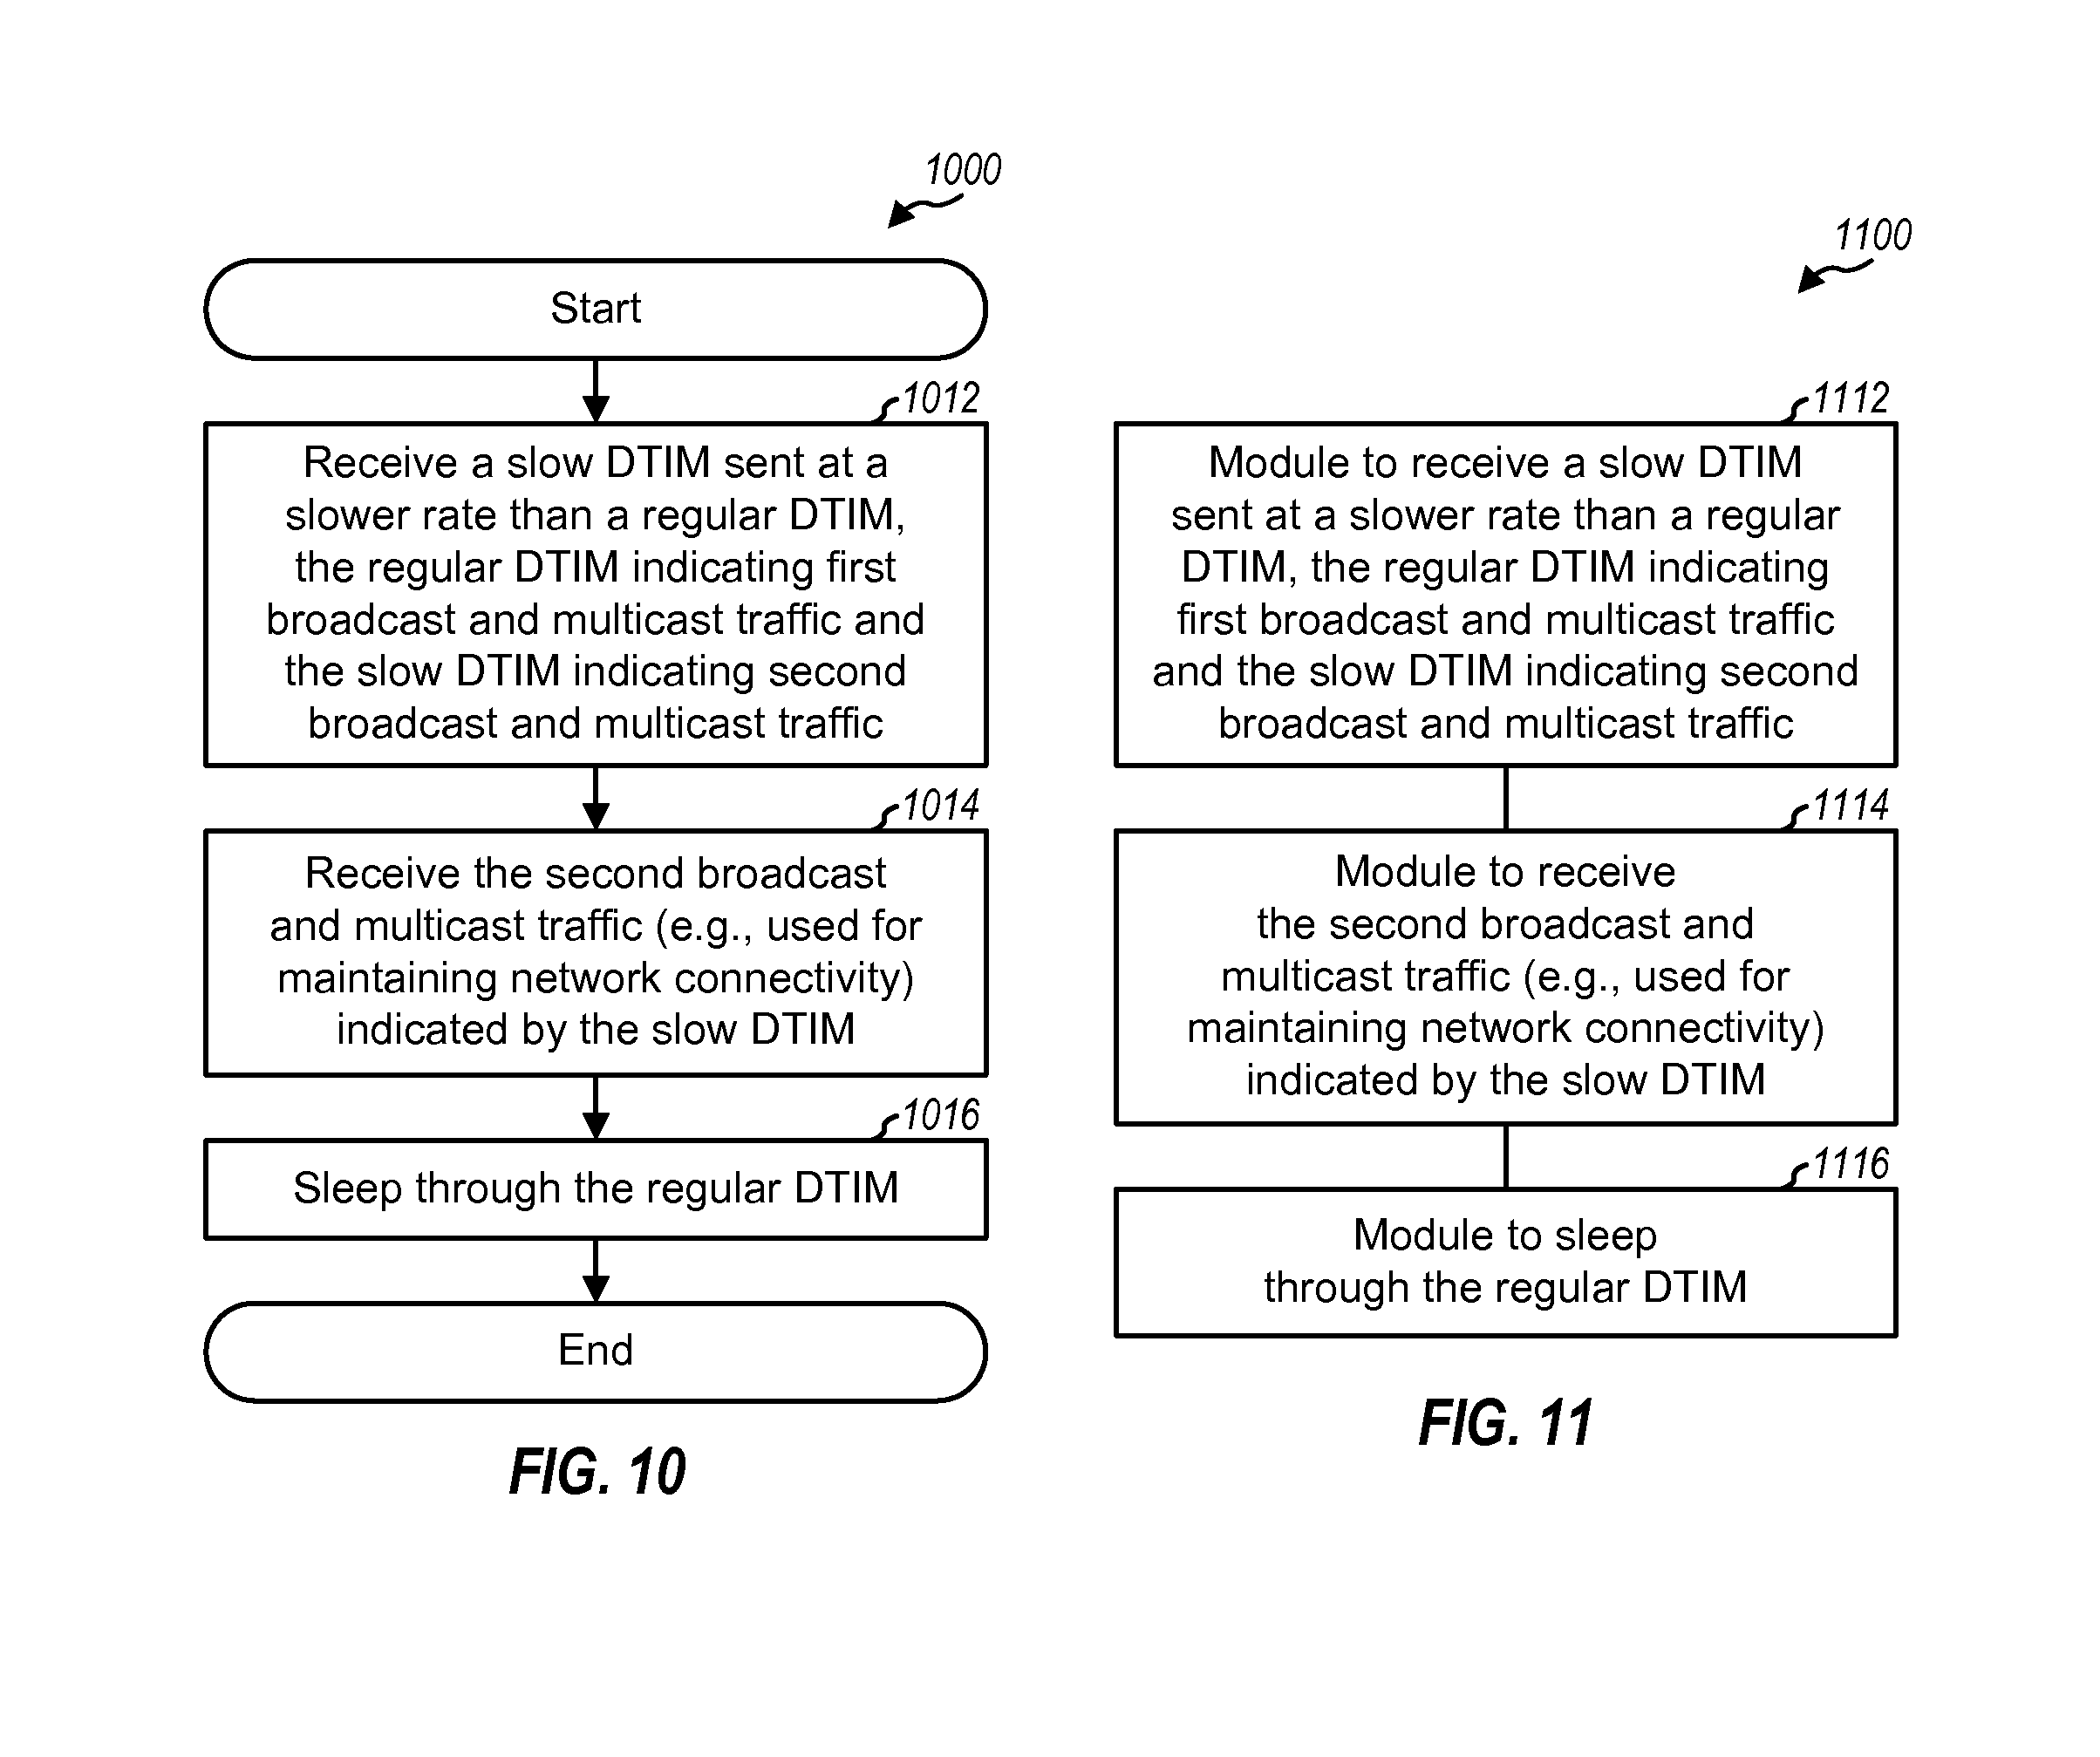 Patent US 8,880,104 B2